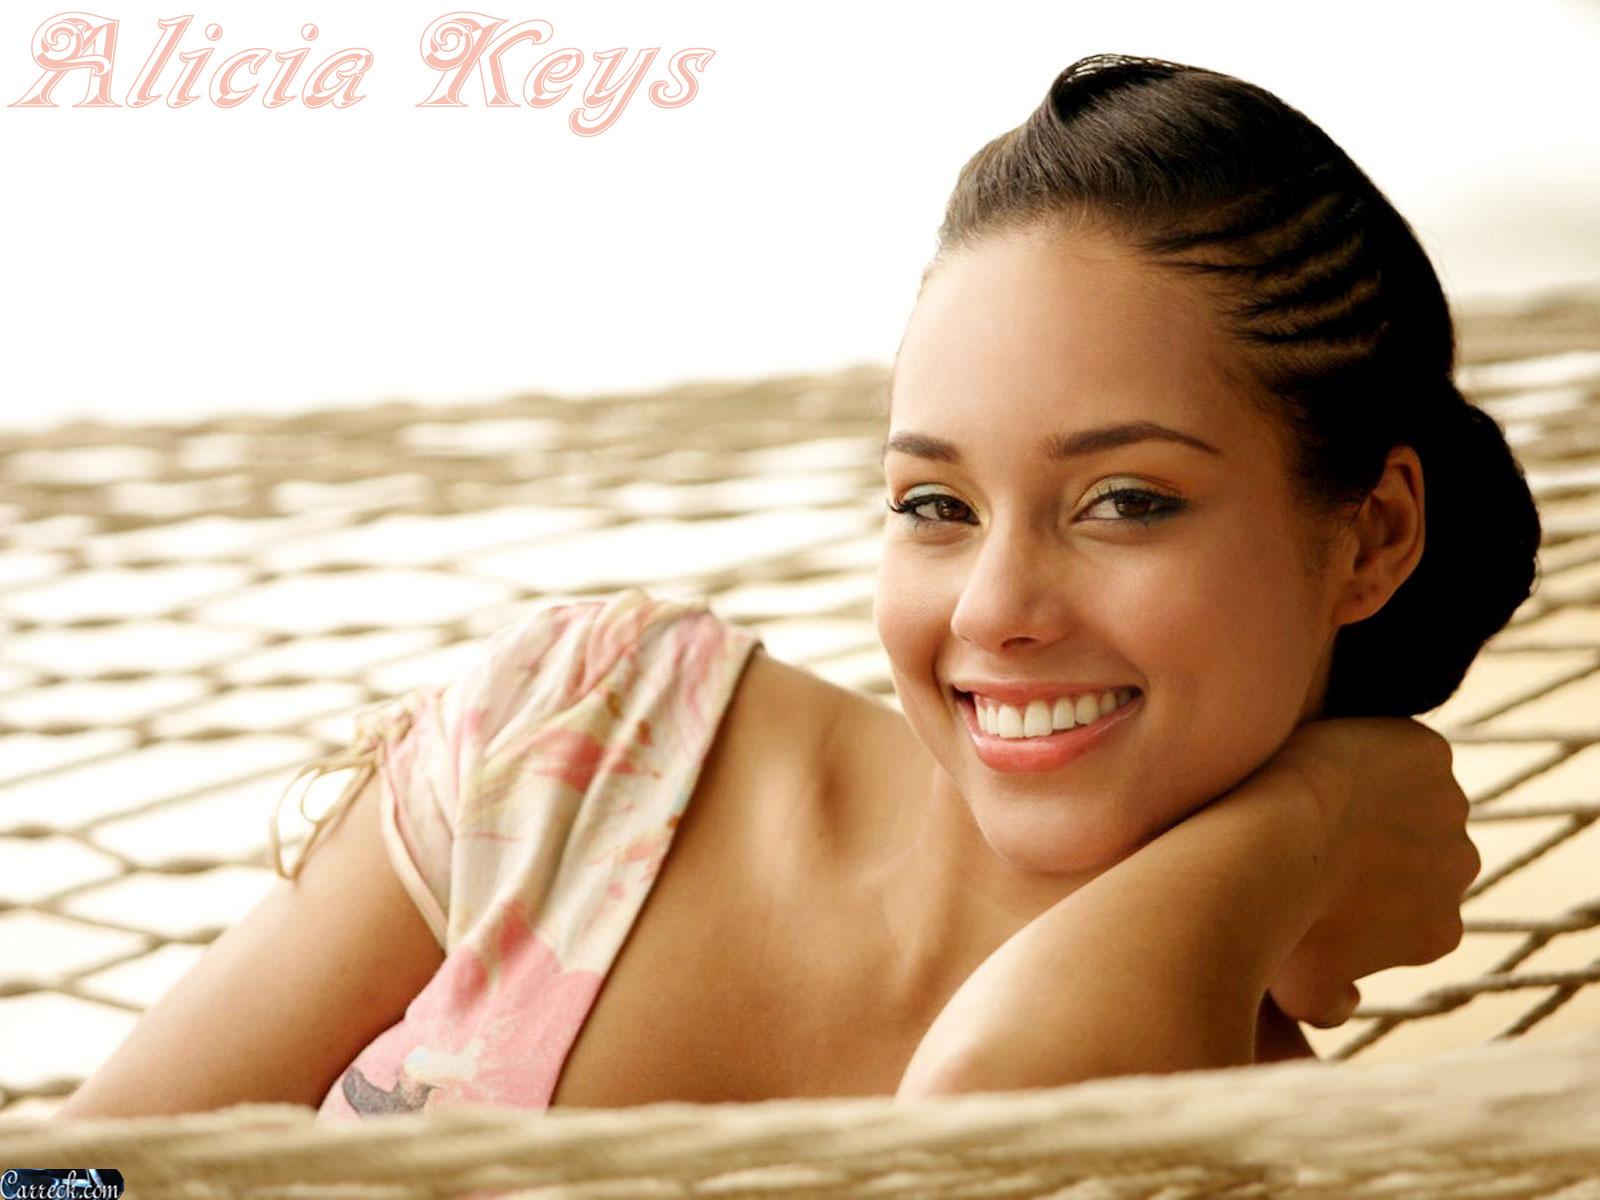 http://3.bp.blogspot.com/-1MWnx3Ihv4k/T64hmYEo4RI/AAAAAAAABKU/b_aZ6cQKfd0/s1600/Alicia-Keys-alicia-keys-20685570-1600-1200.jpg